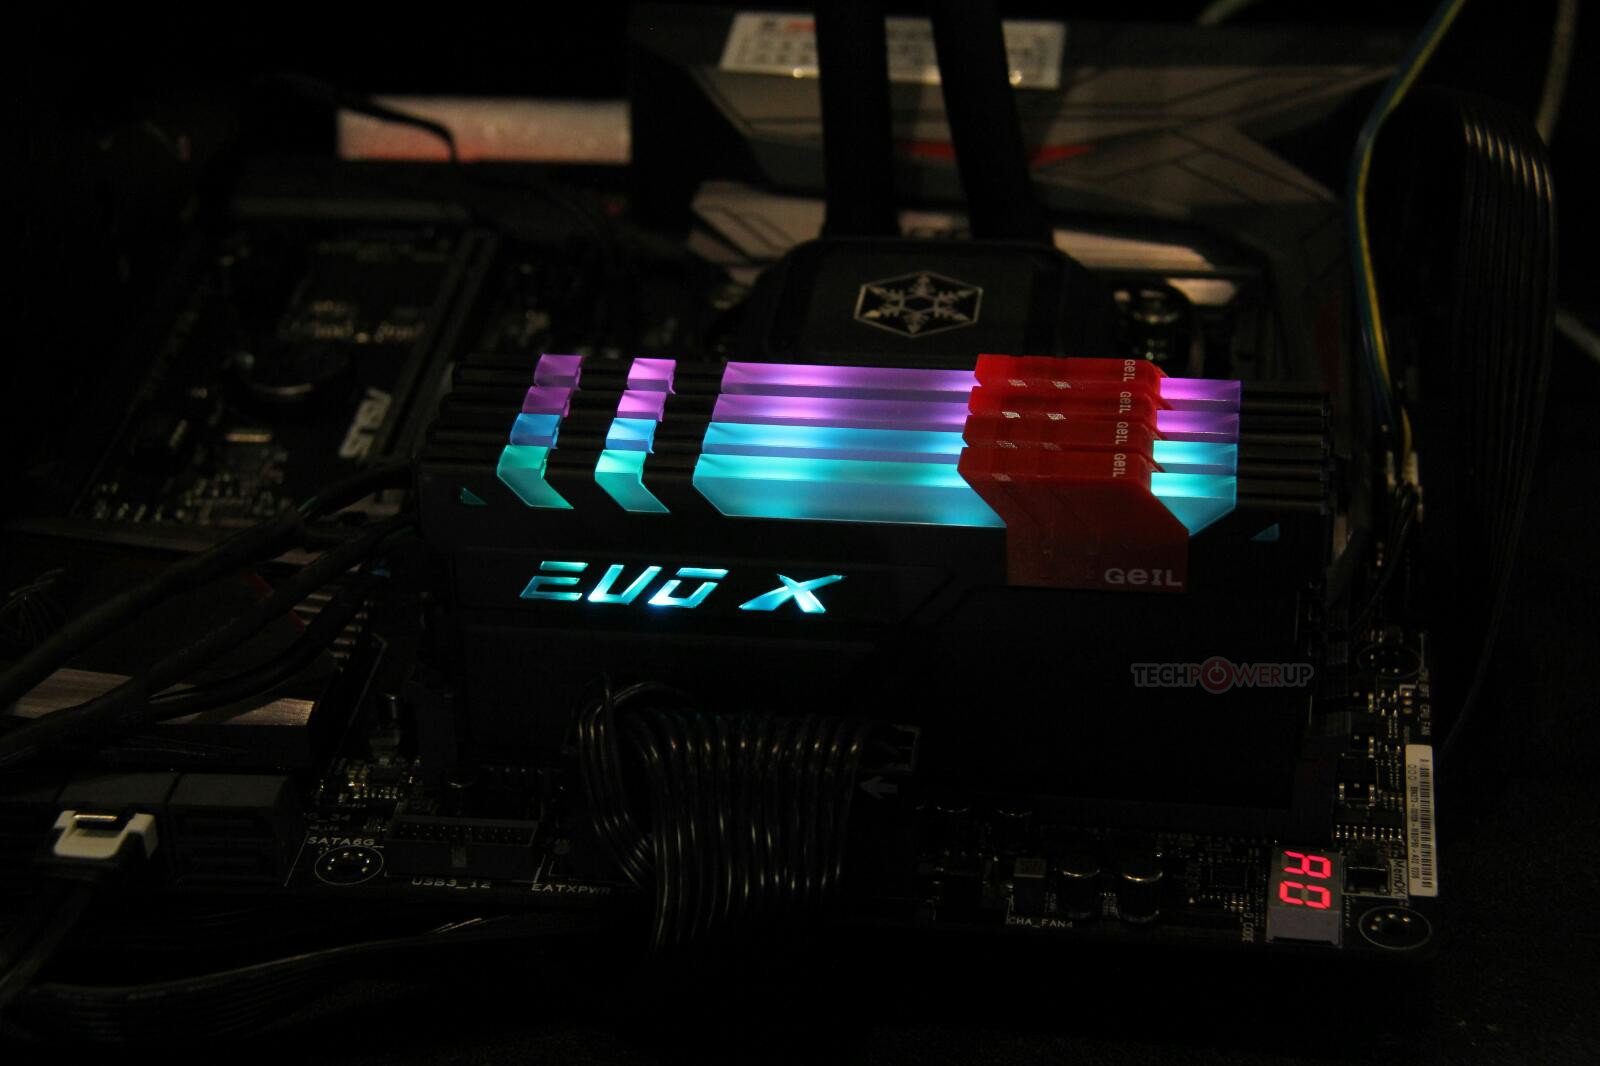 GeIL EVO X – Beleuchtung über USB-Anschluss konfigurierbar